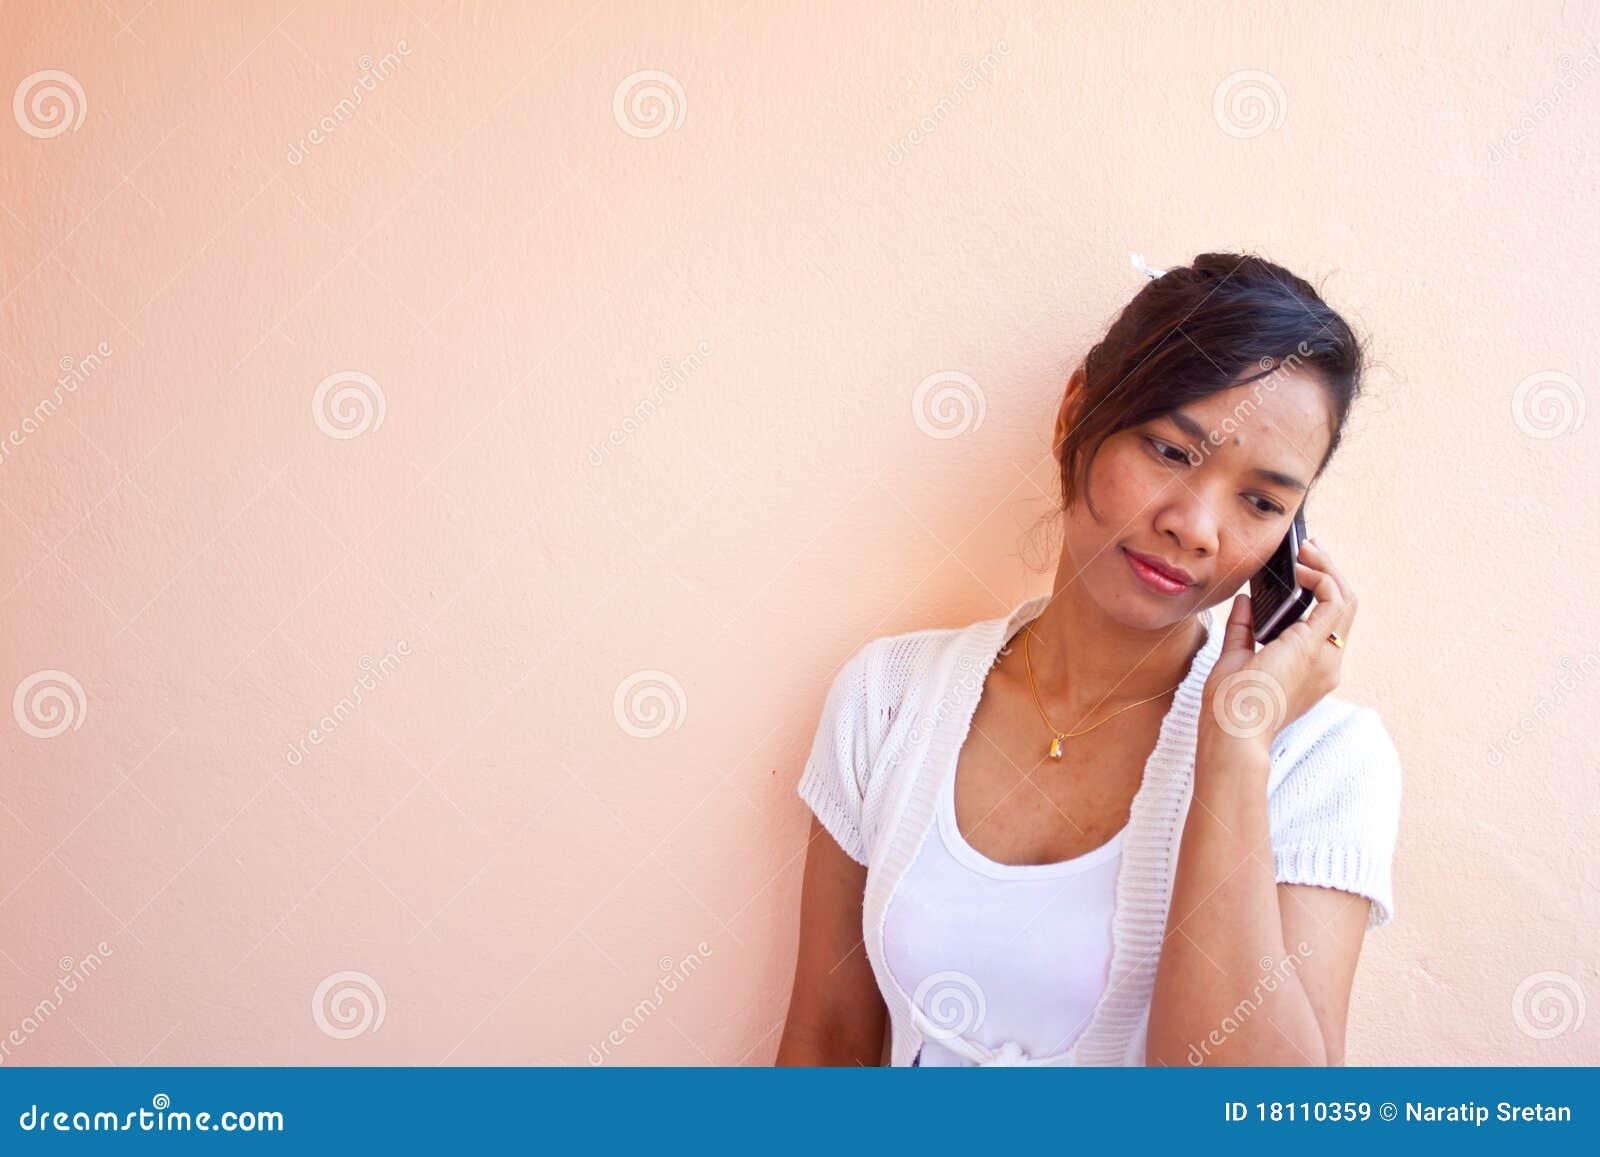 call girl århus girl sex sms